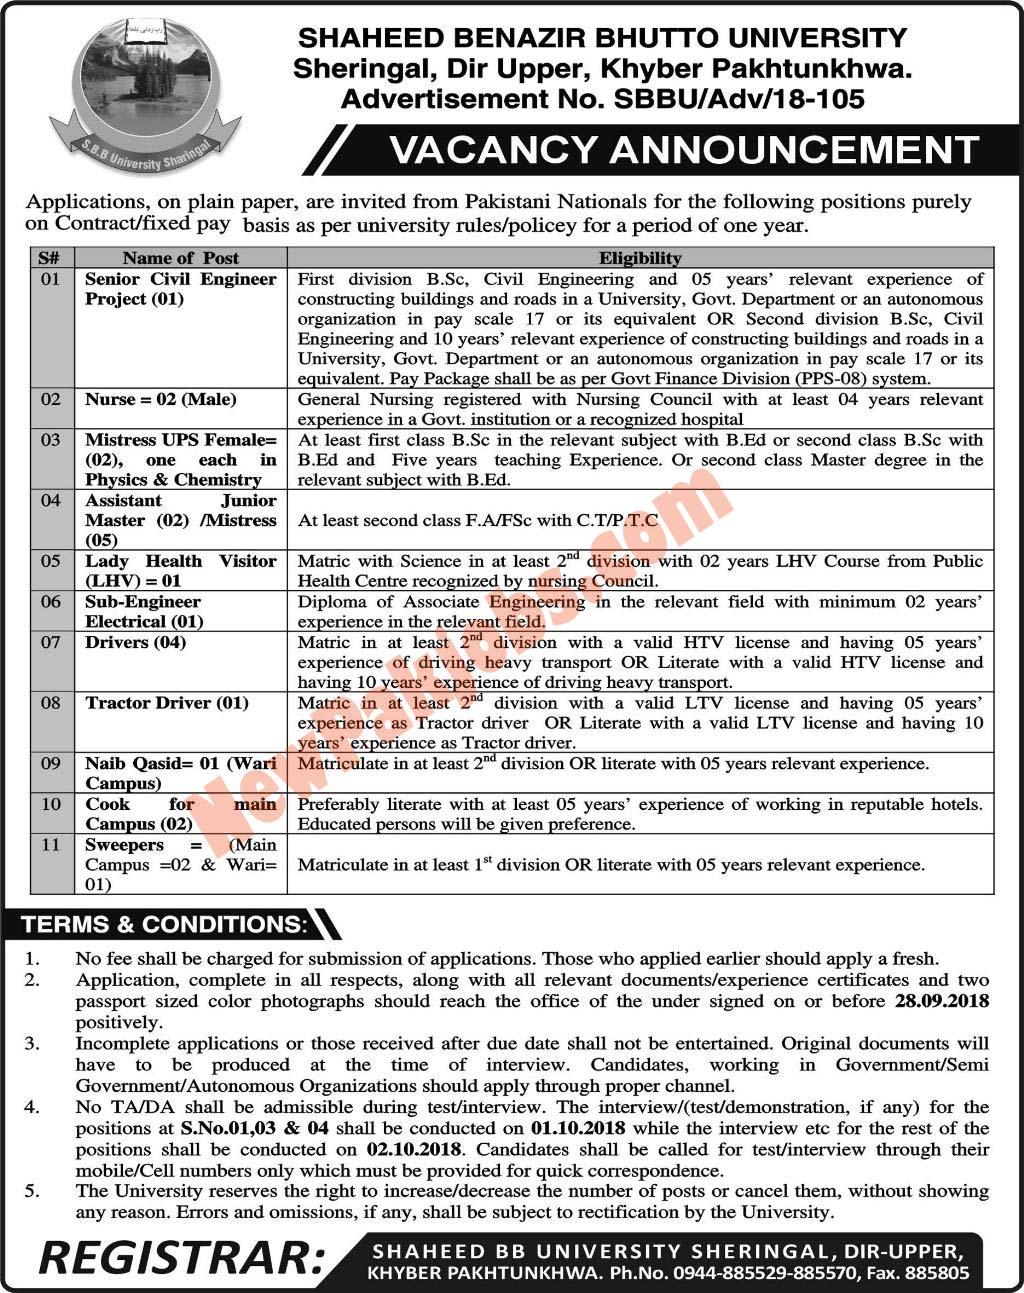 Shaheed Benazir Bhutto University Offered Latest Jobs 2018